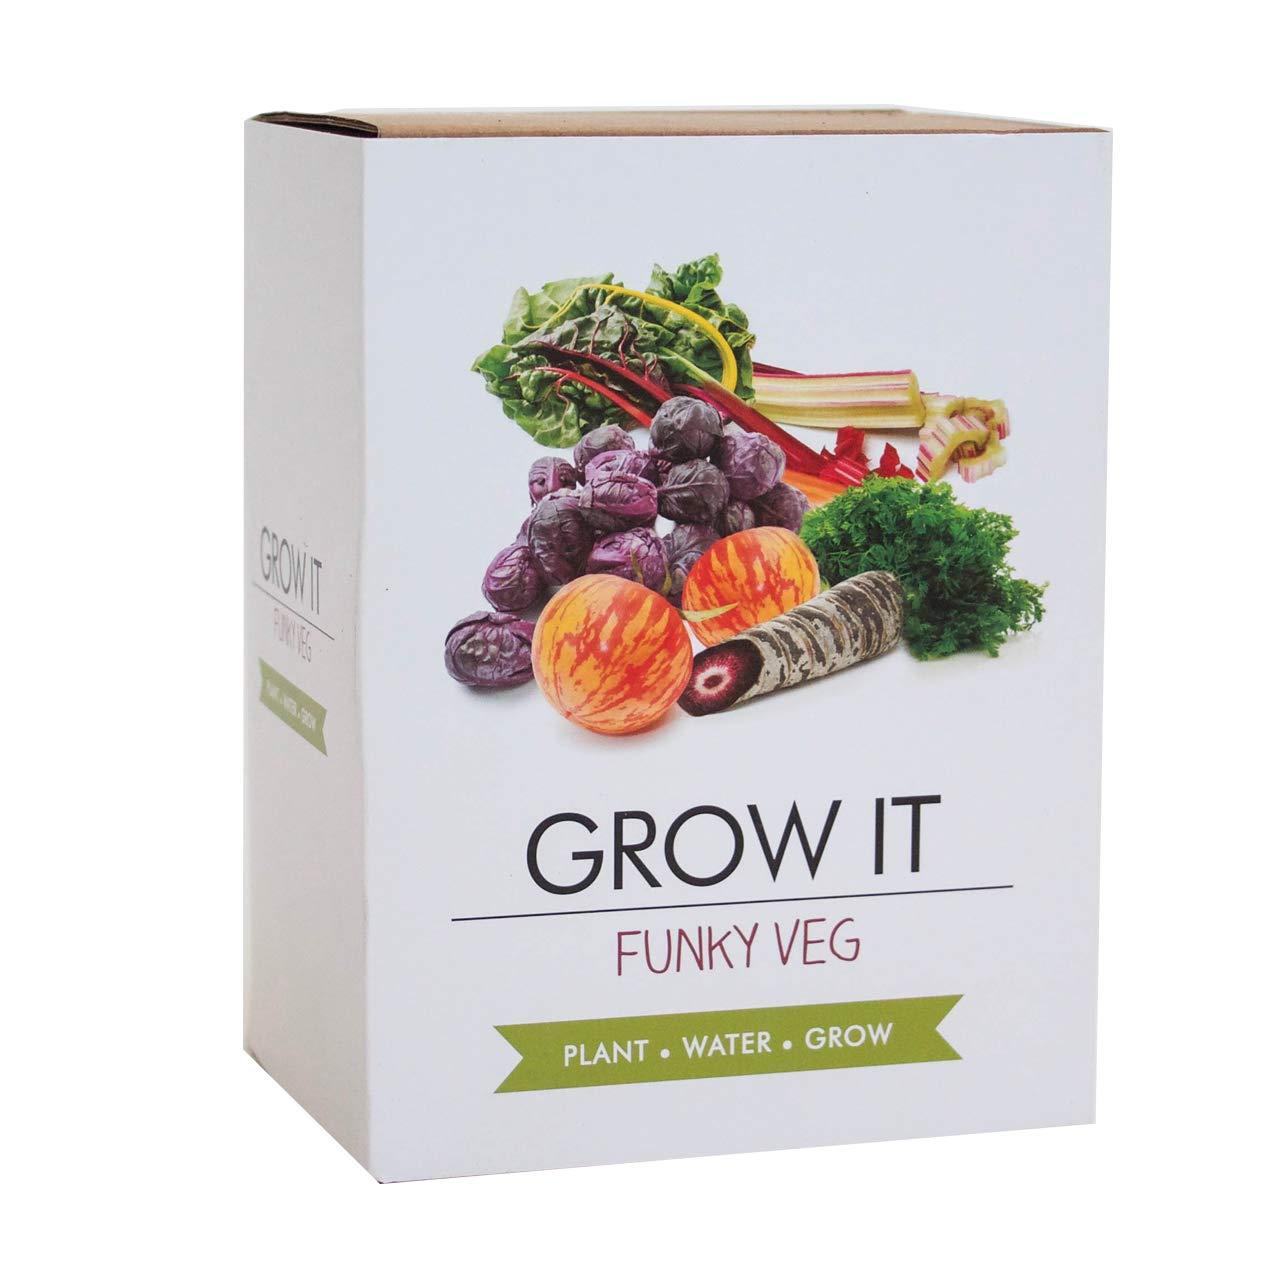 GROW IT Funky Gemü se - Geschenk - Anzuchtset Gift Republic